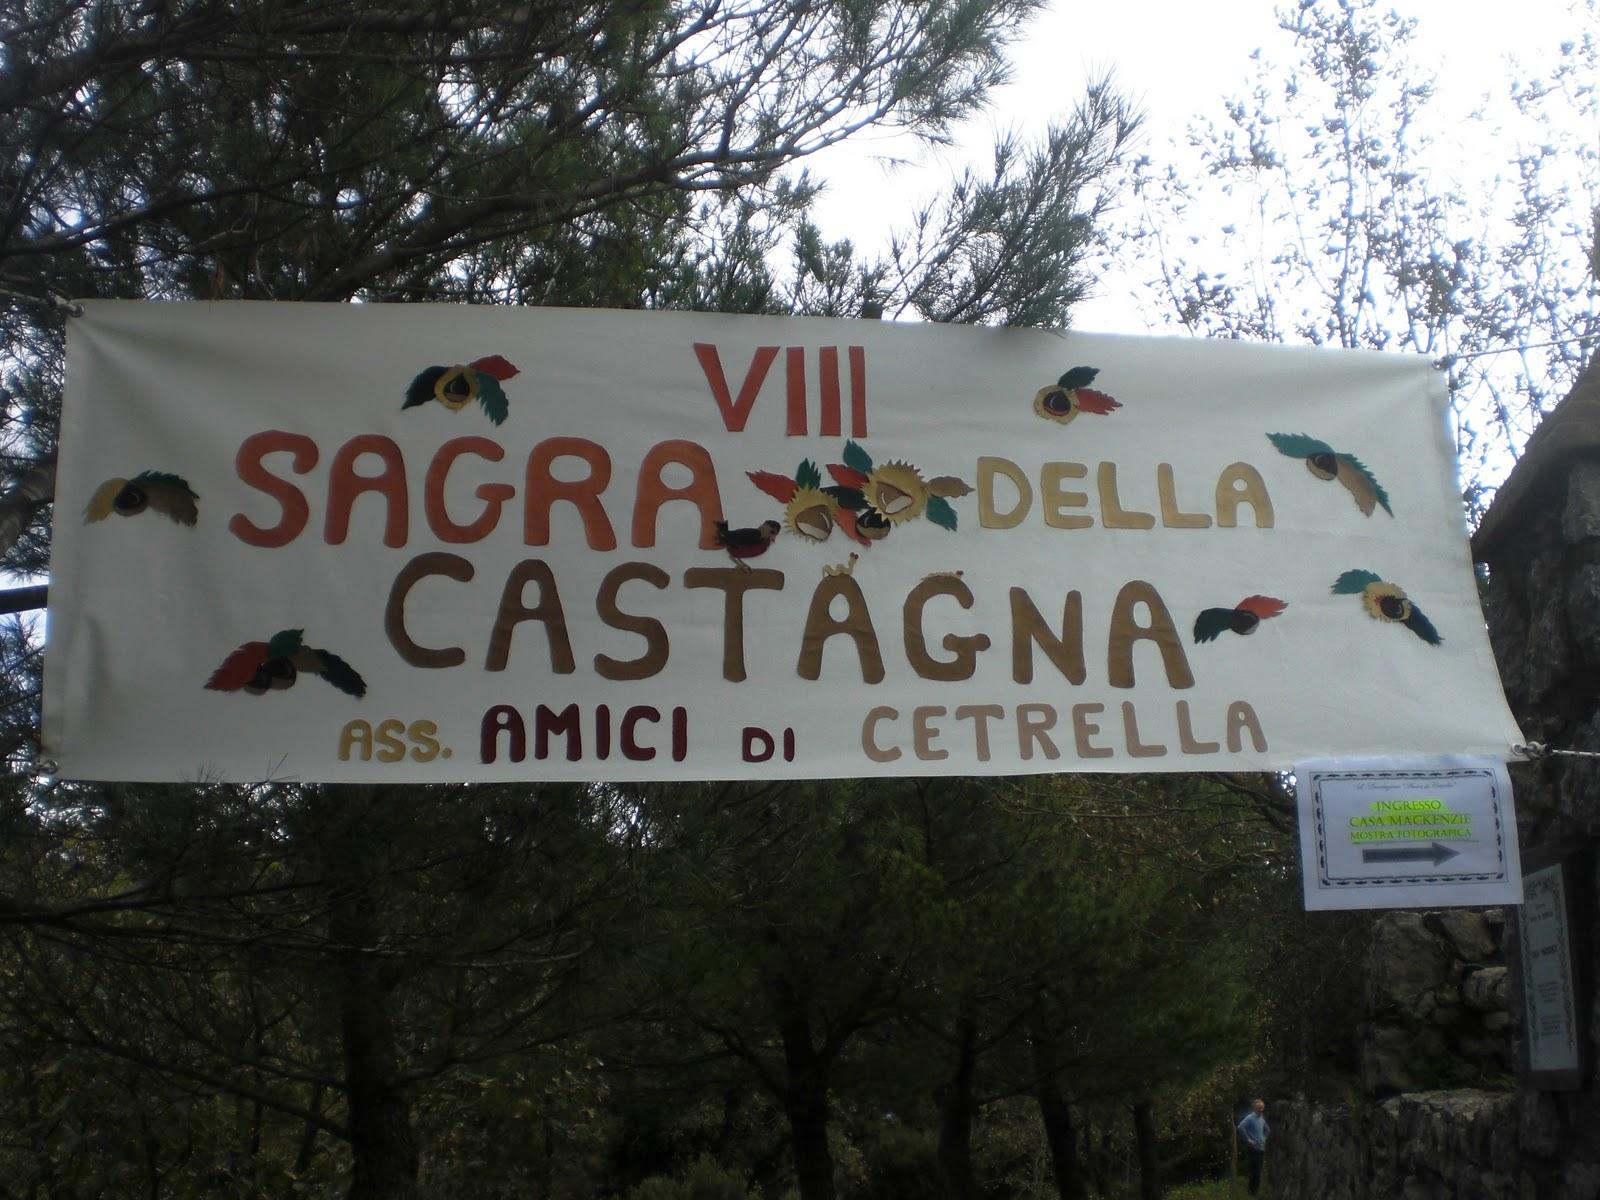 Capri,la Sagra della castagna a Cetrella